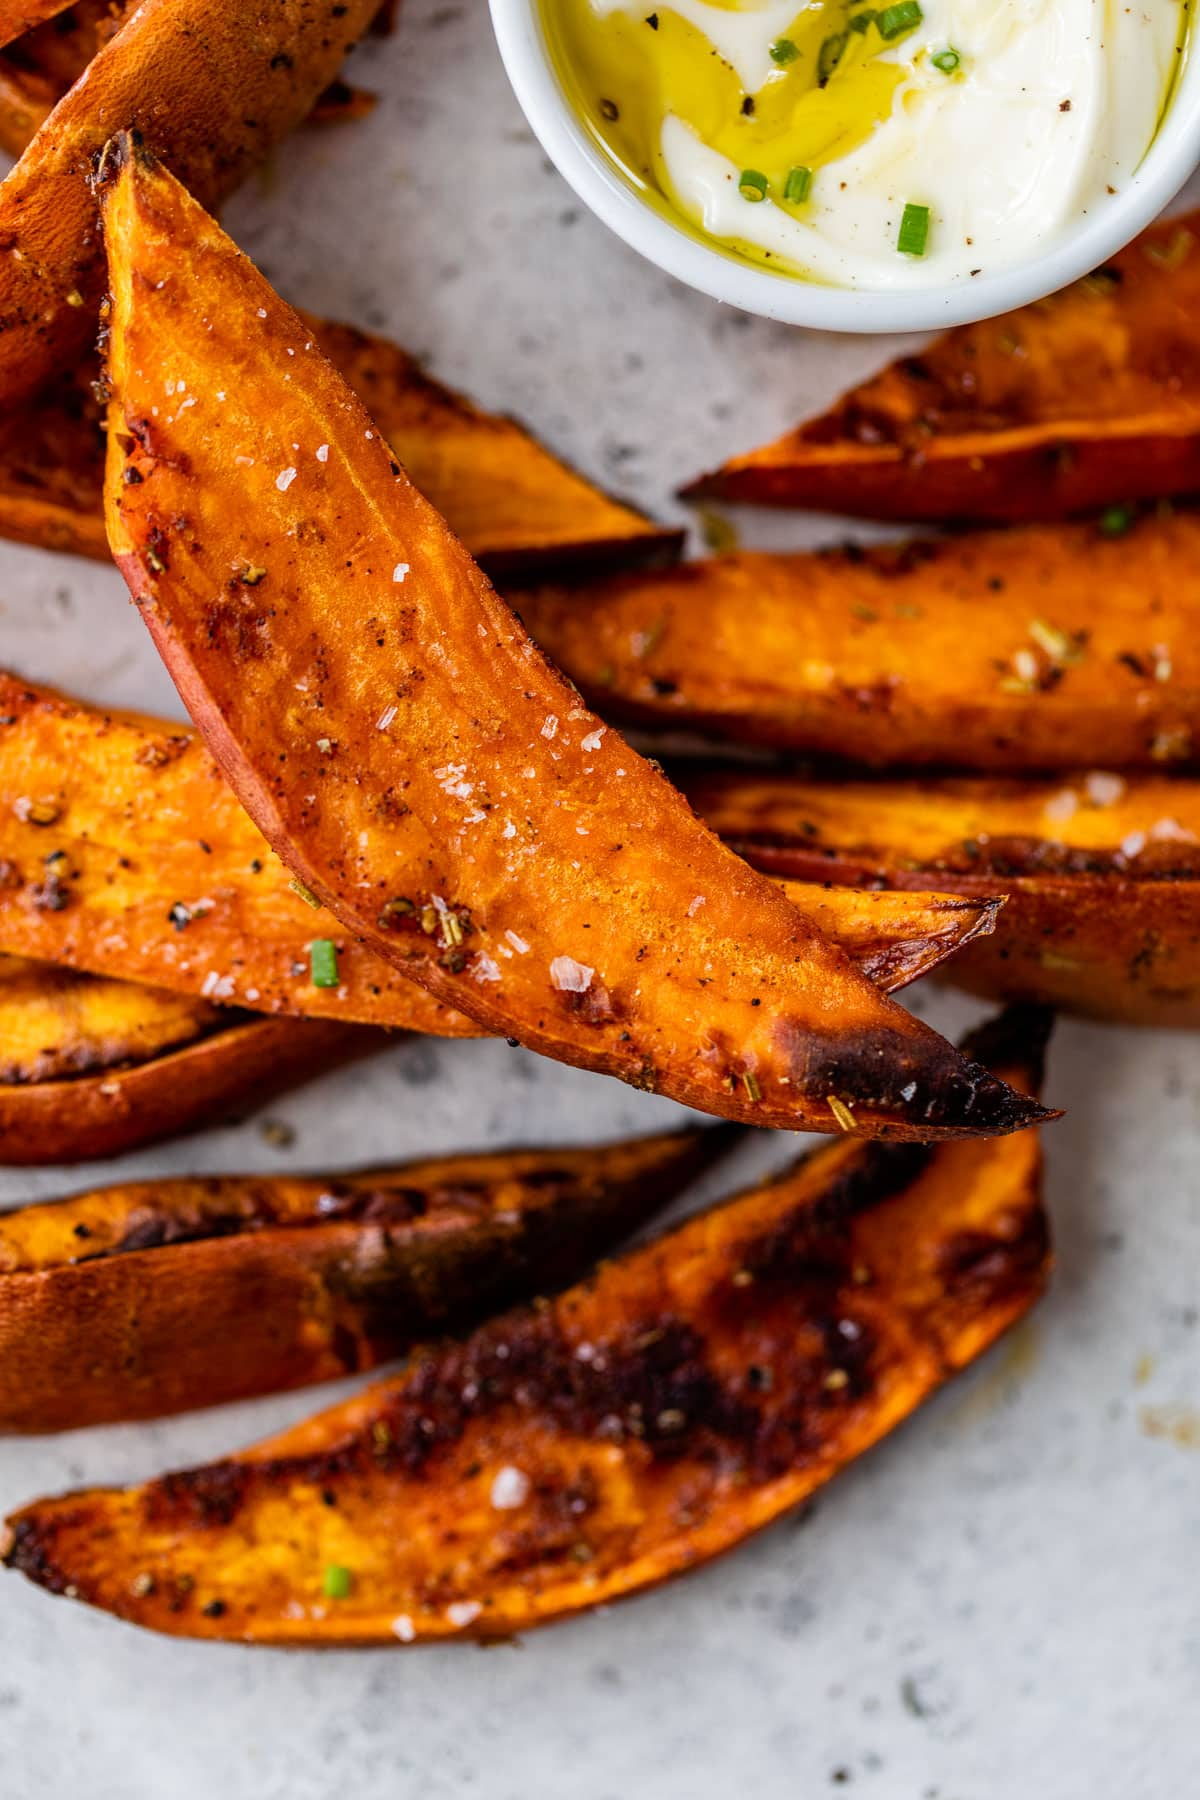 Sweet potato wedges with seasoning